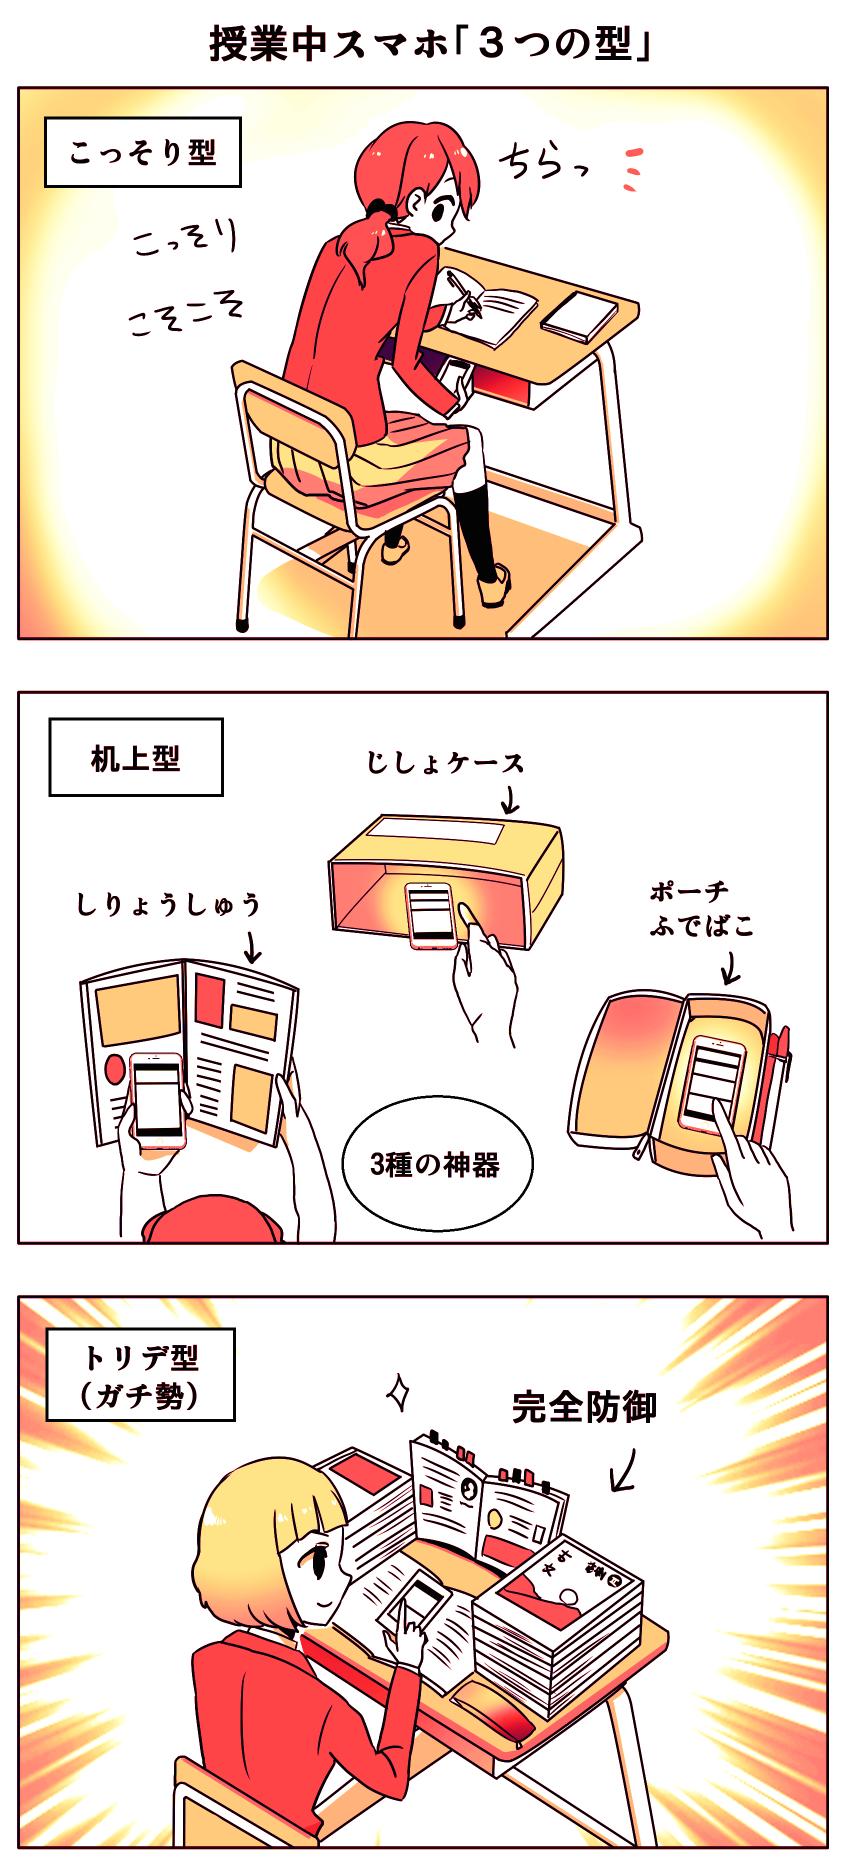 harajuku_manga_schoolsmapho